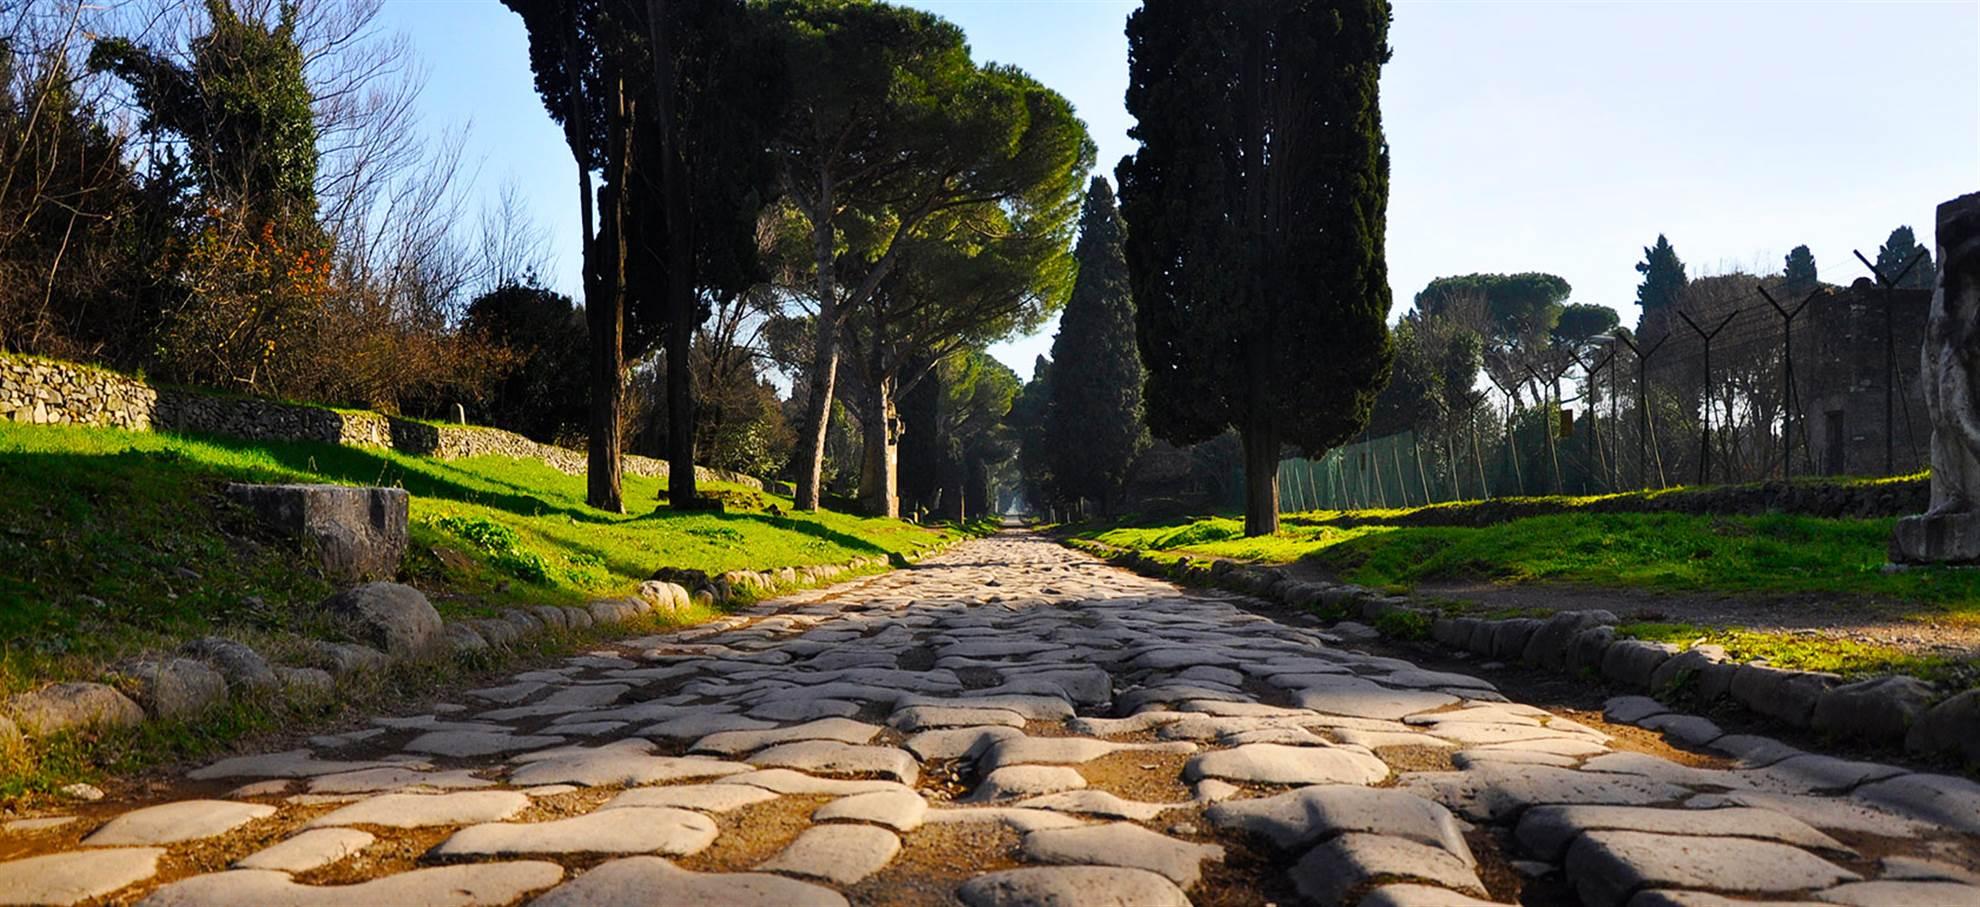 Visite de la Via Appia